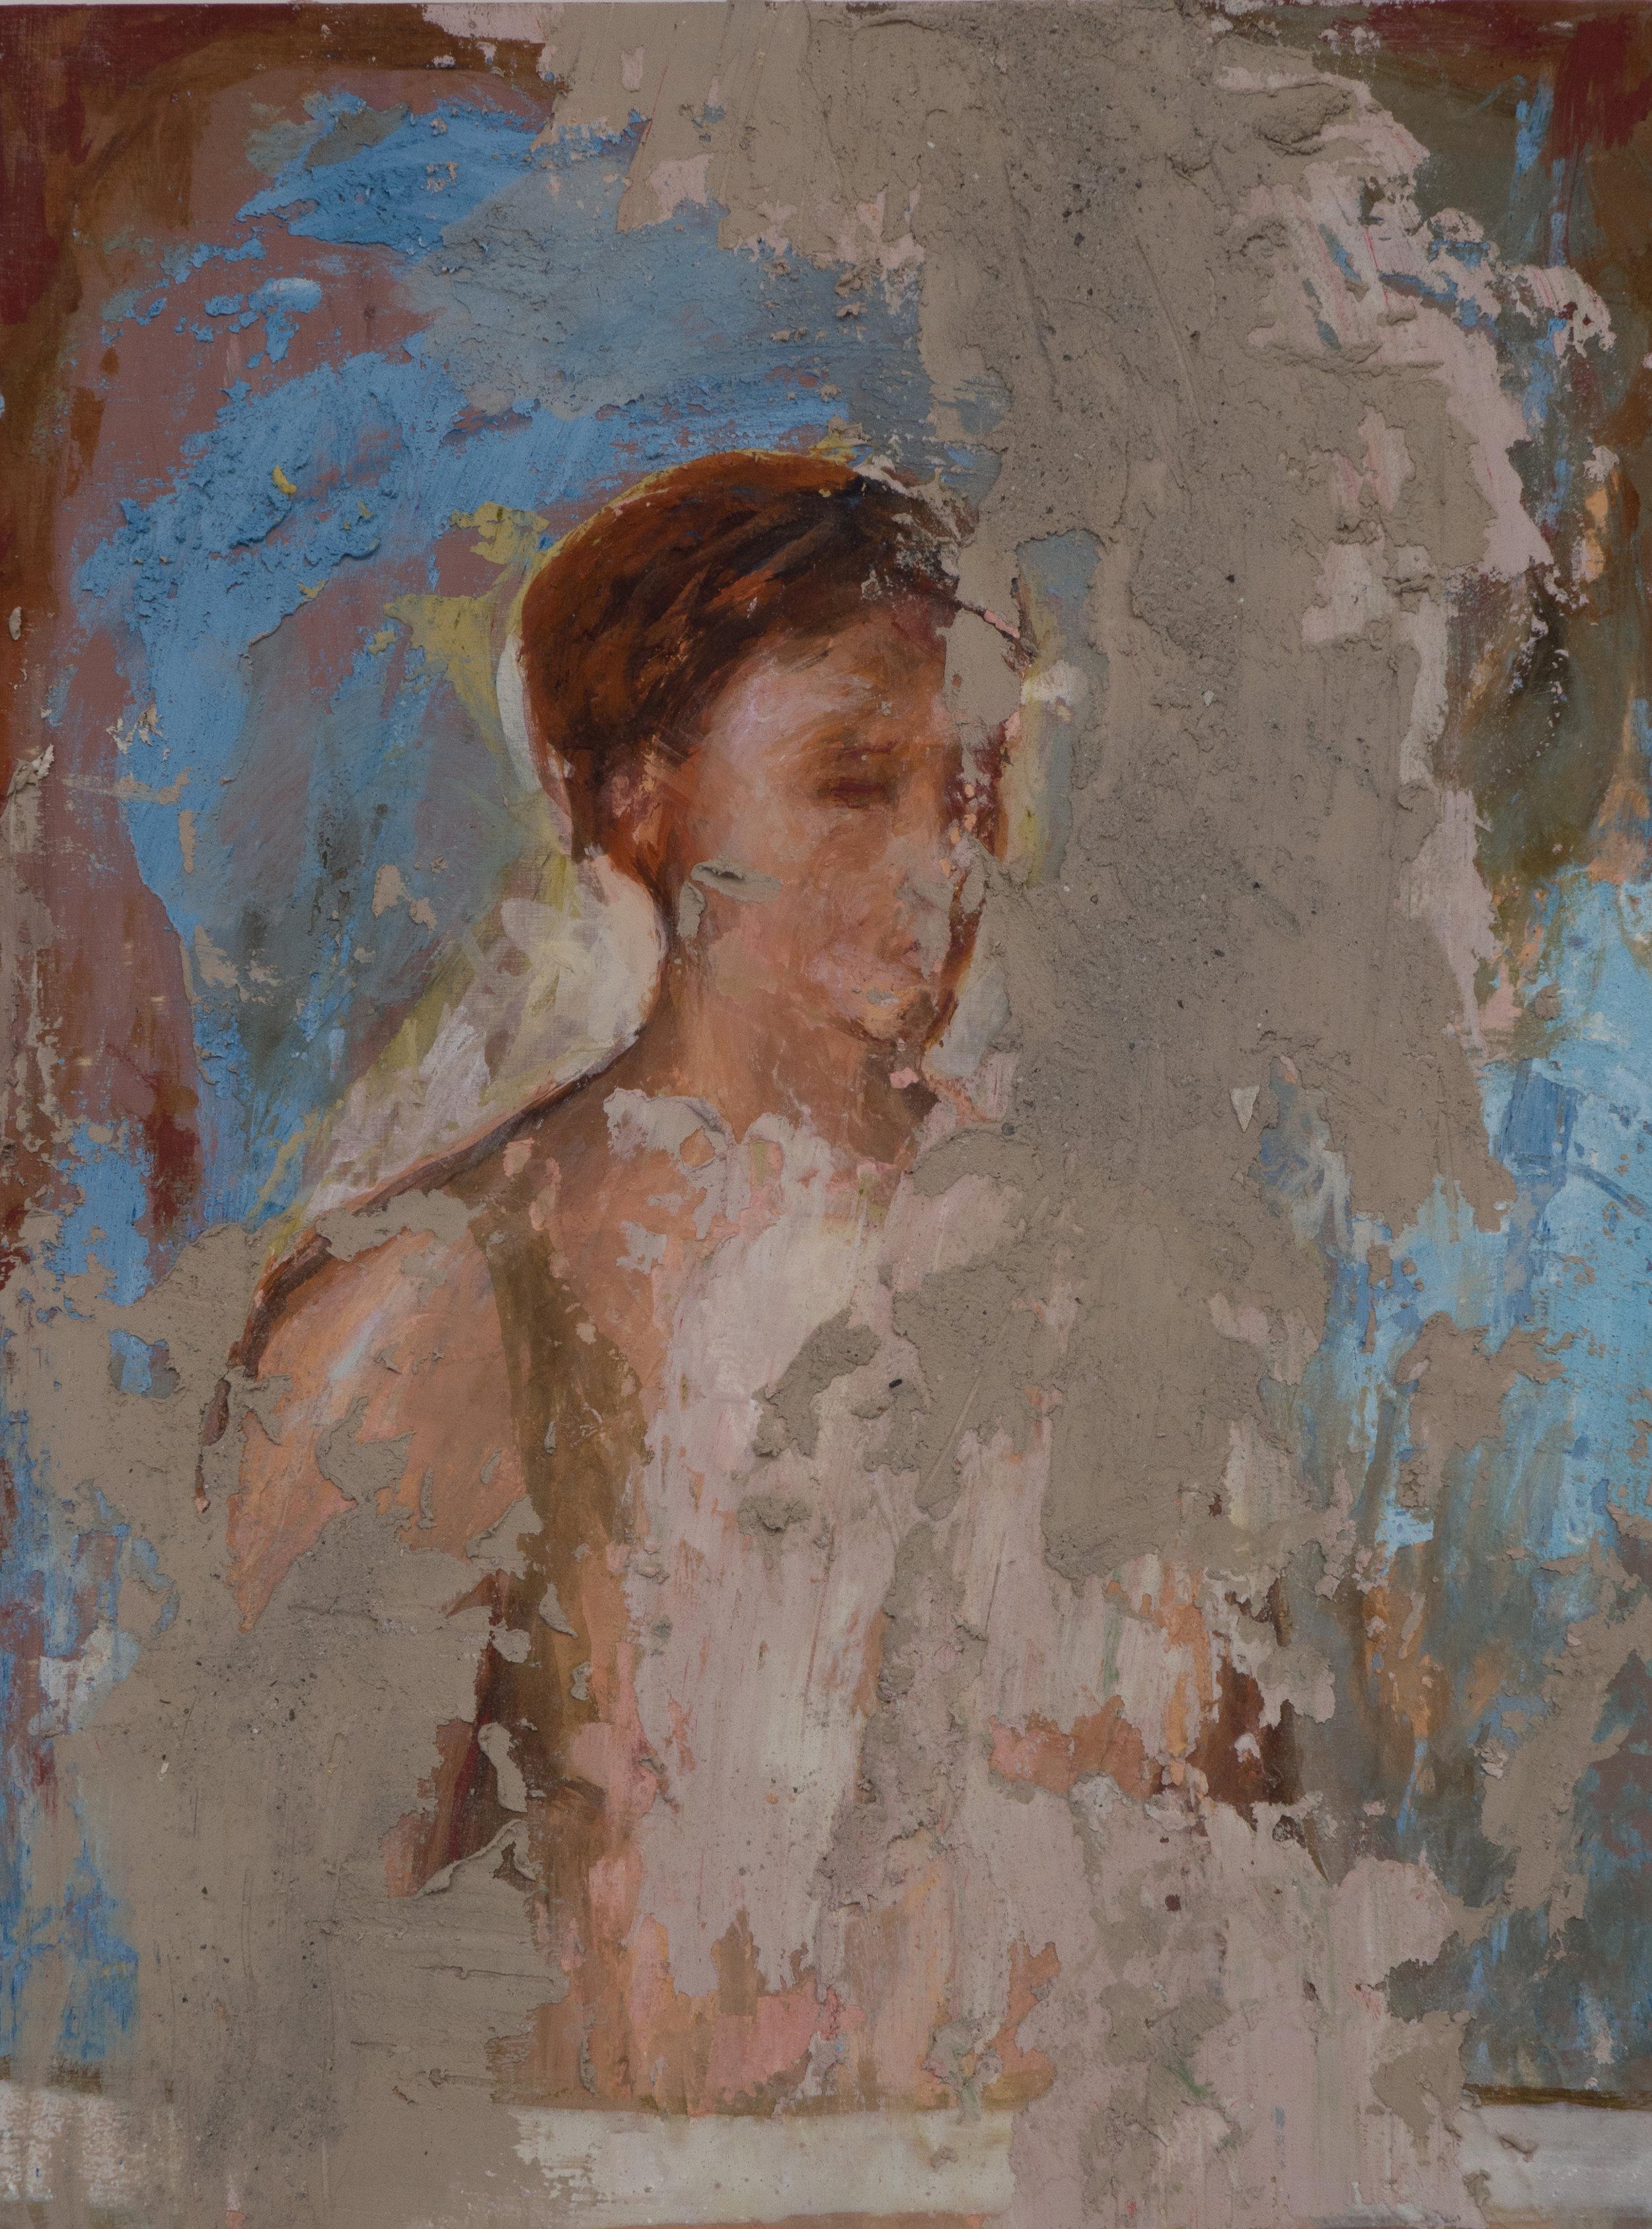 Shelley Vanderbyl - Untitled (Woman) (Full Crop) - 2016 - Fresco on Panel - 8x10.jpg